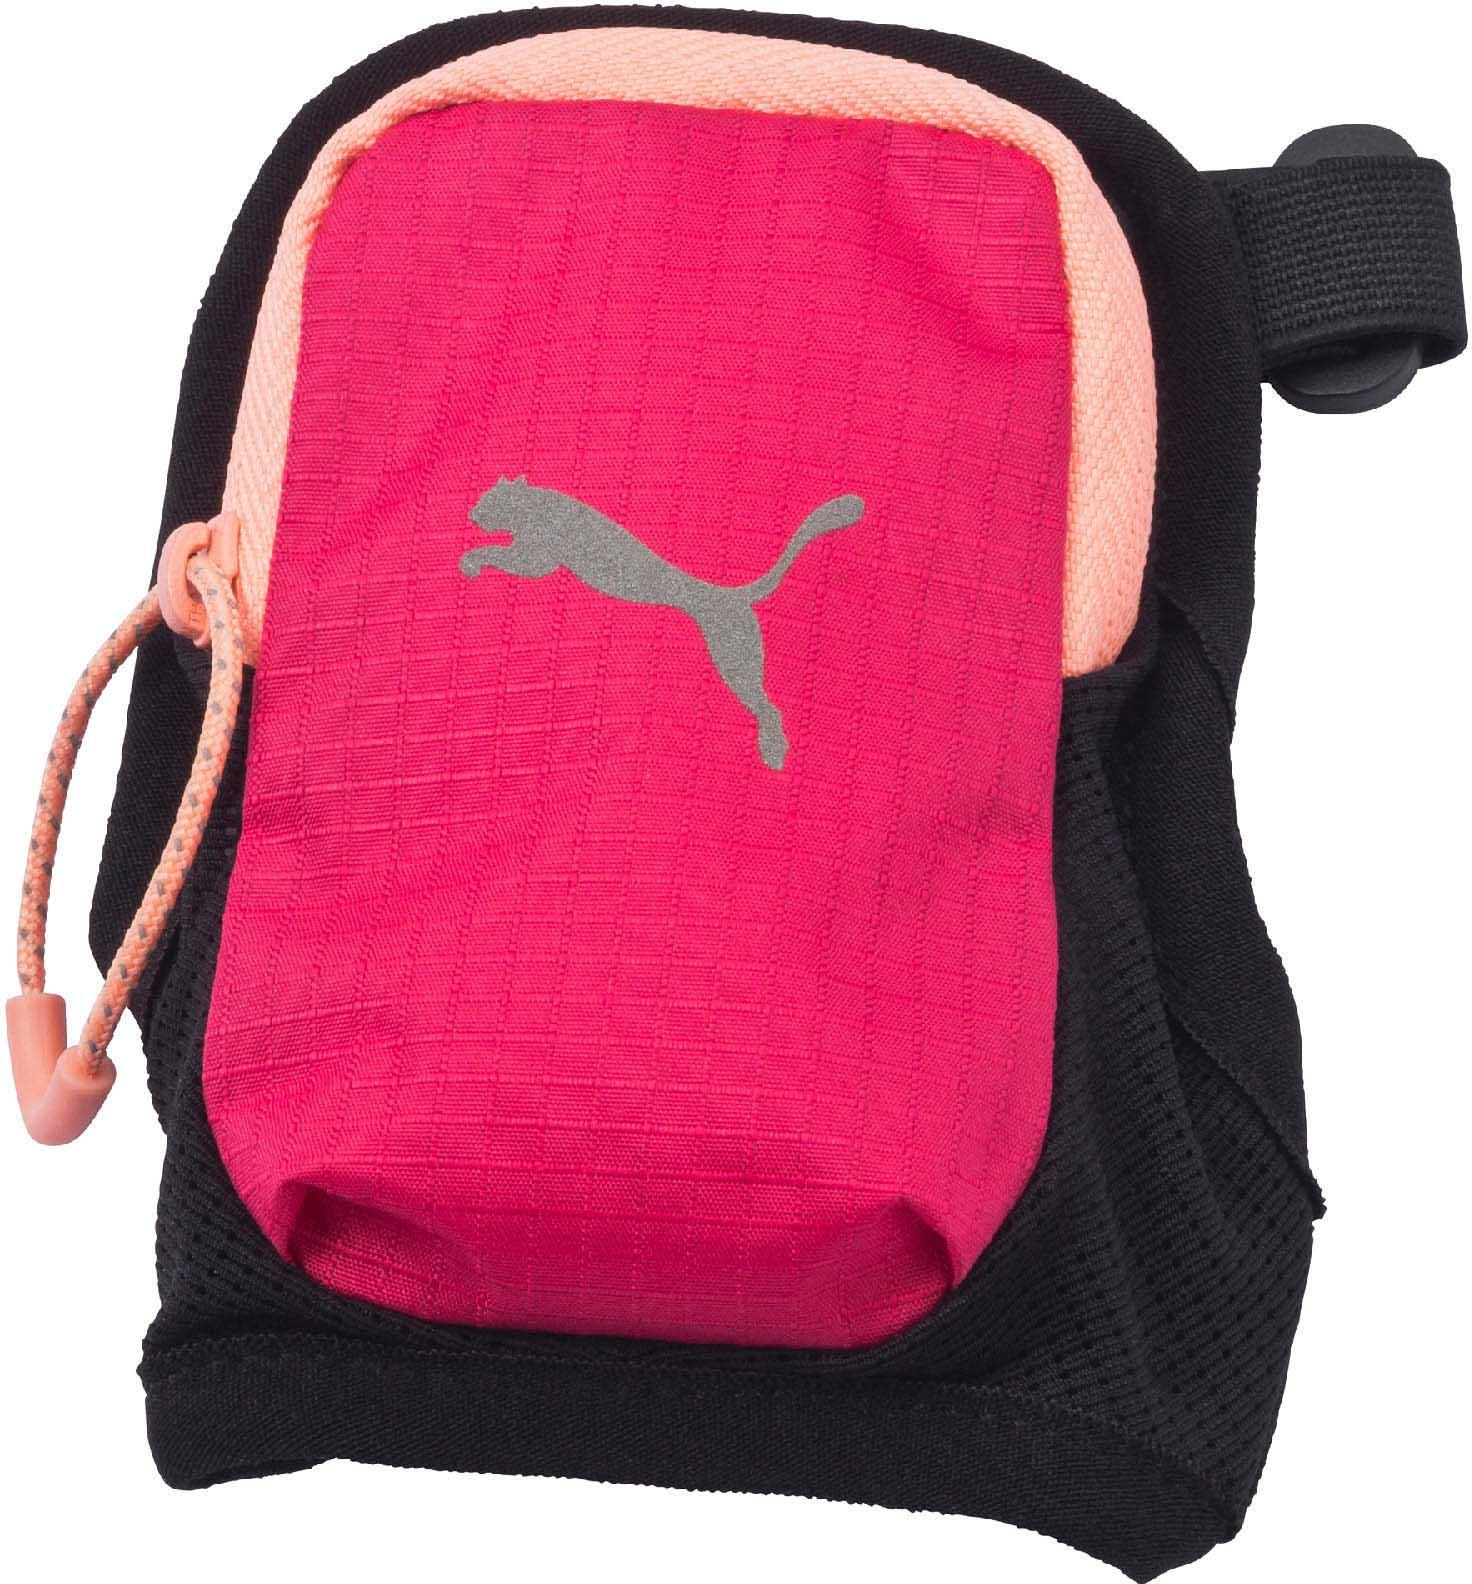 Sportovní kapsa Puma PR Hand Pocket